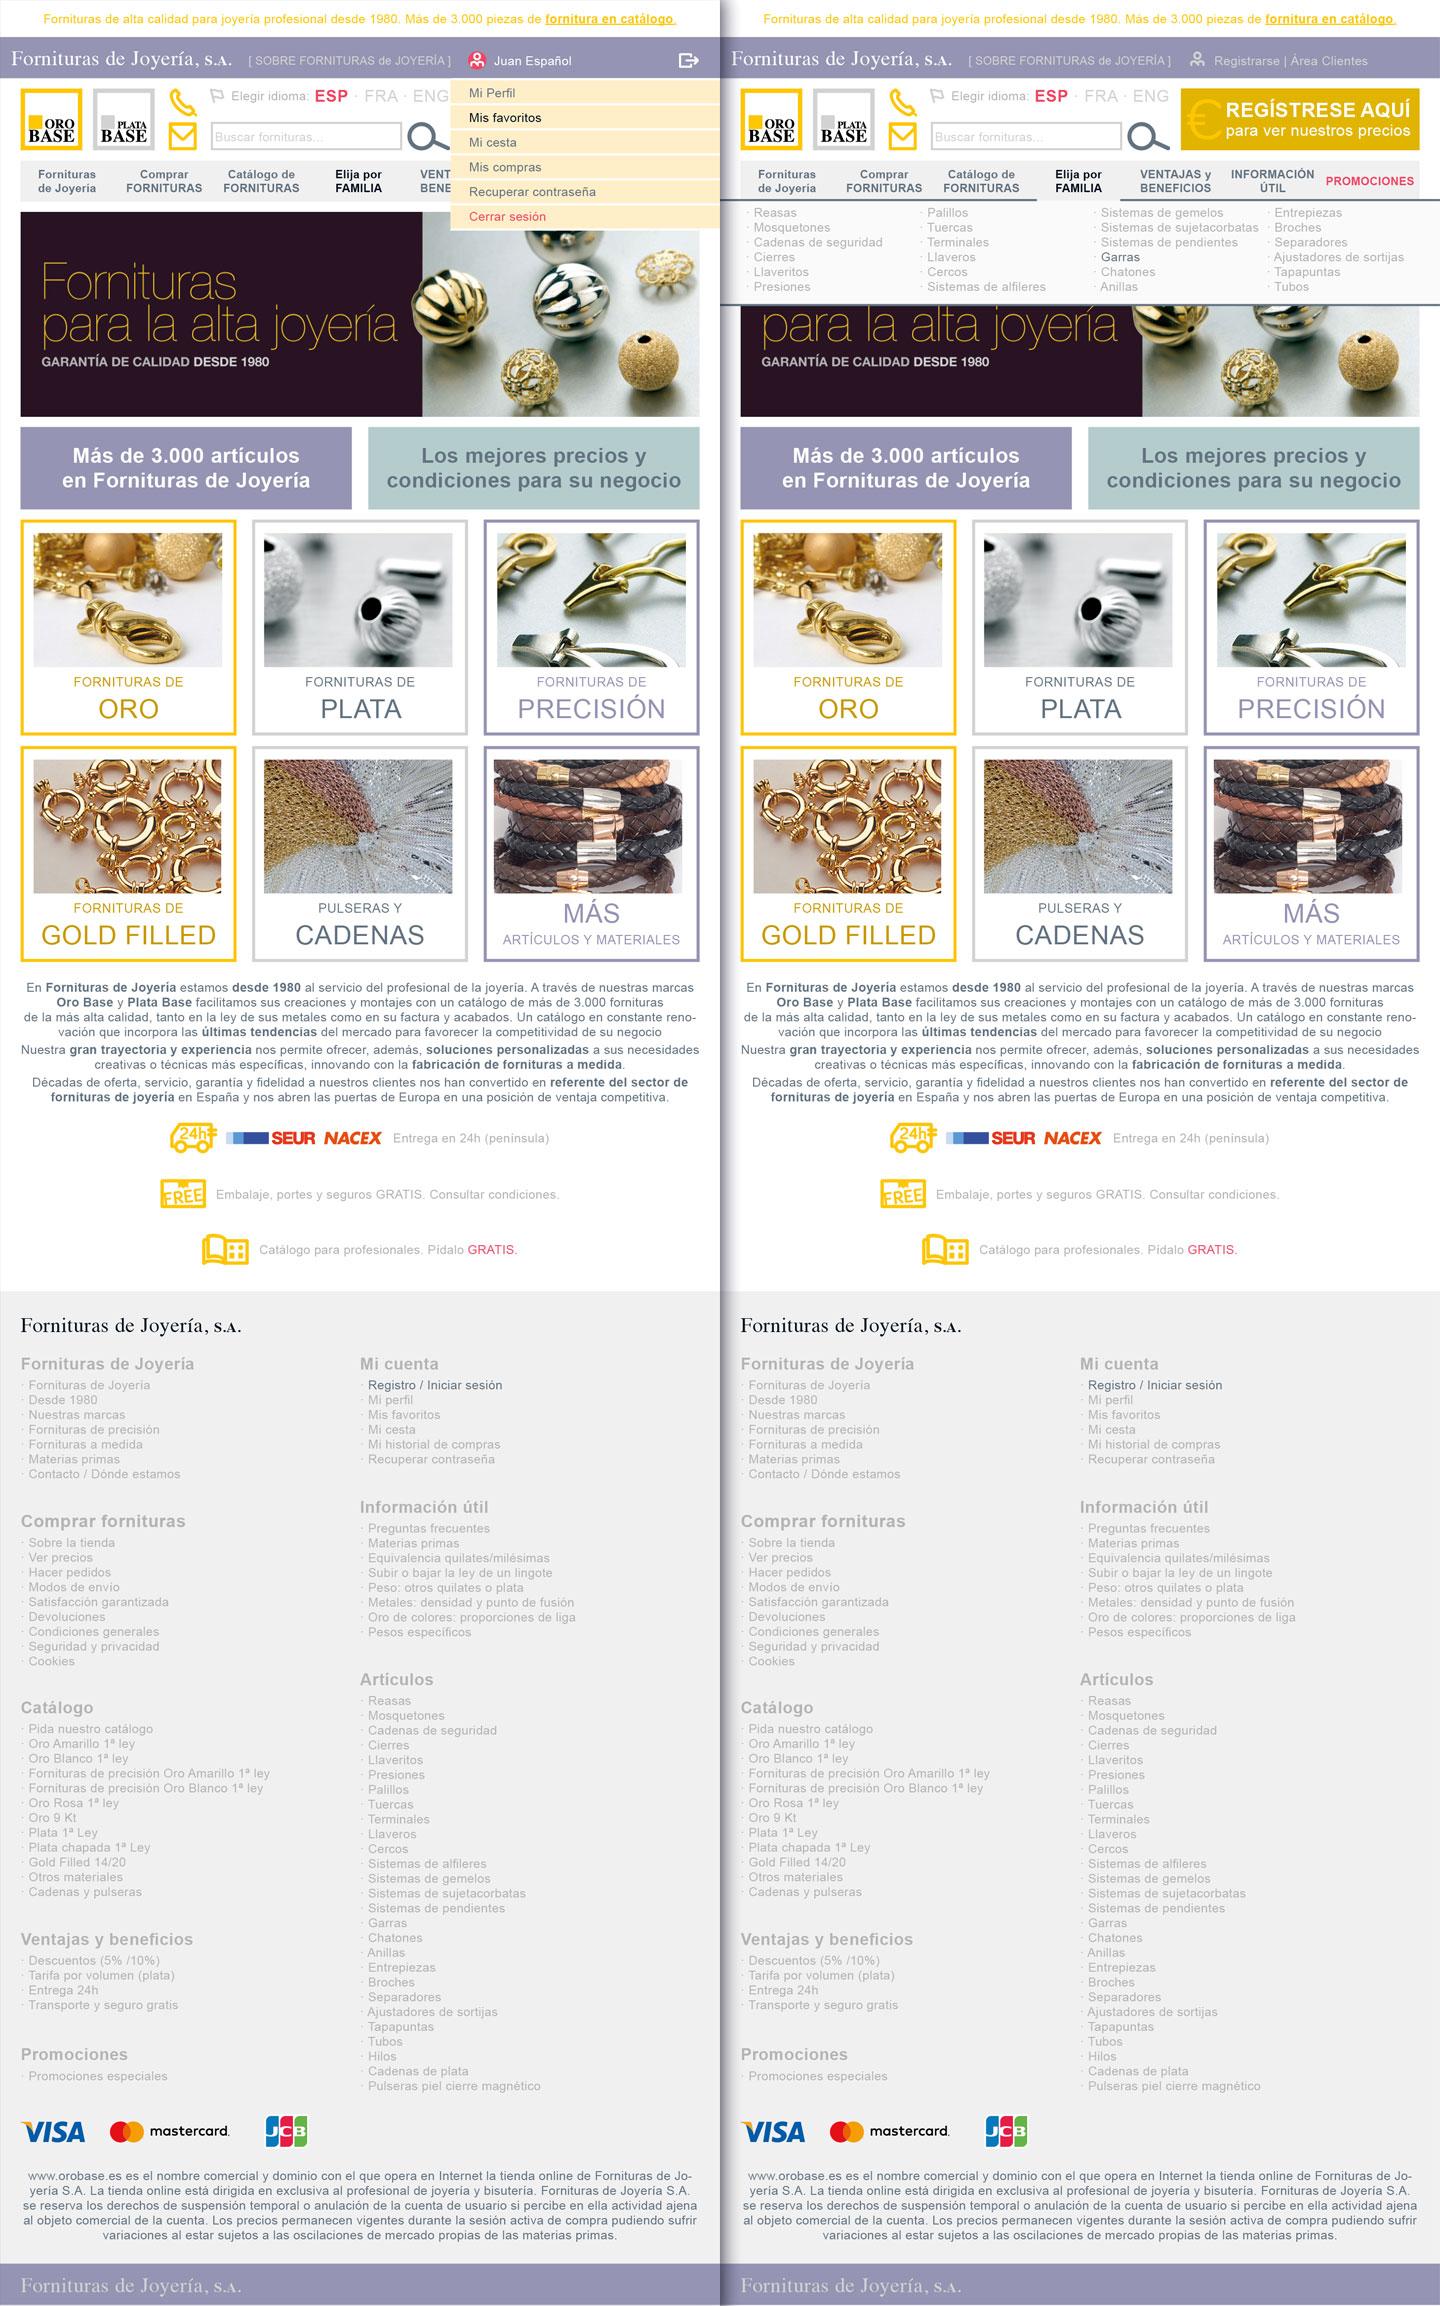 Fornituras de Joyería. Catálogo web: prototipado diseños web formato tablet